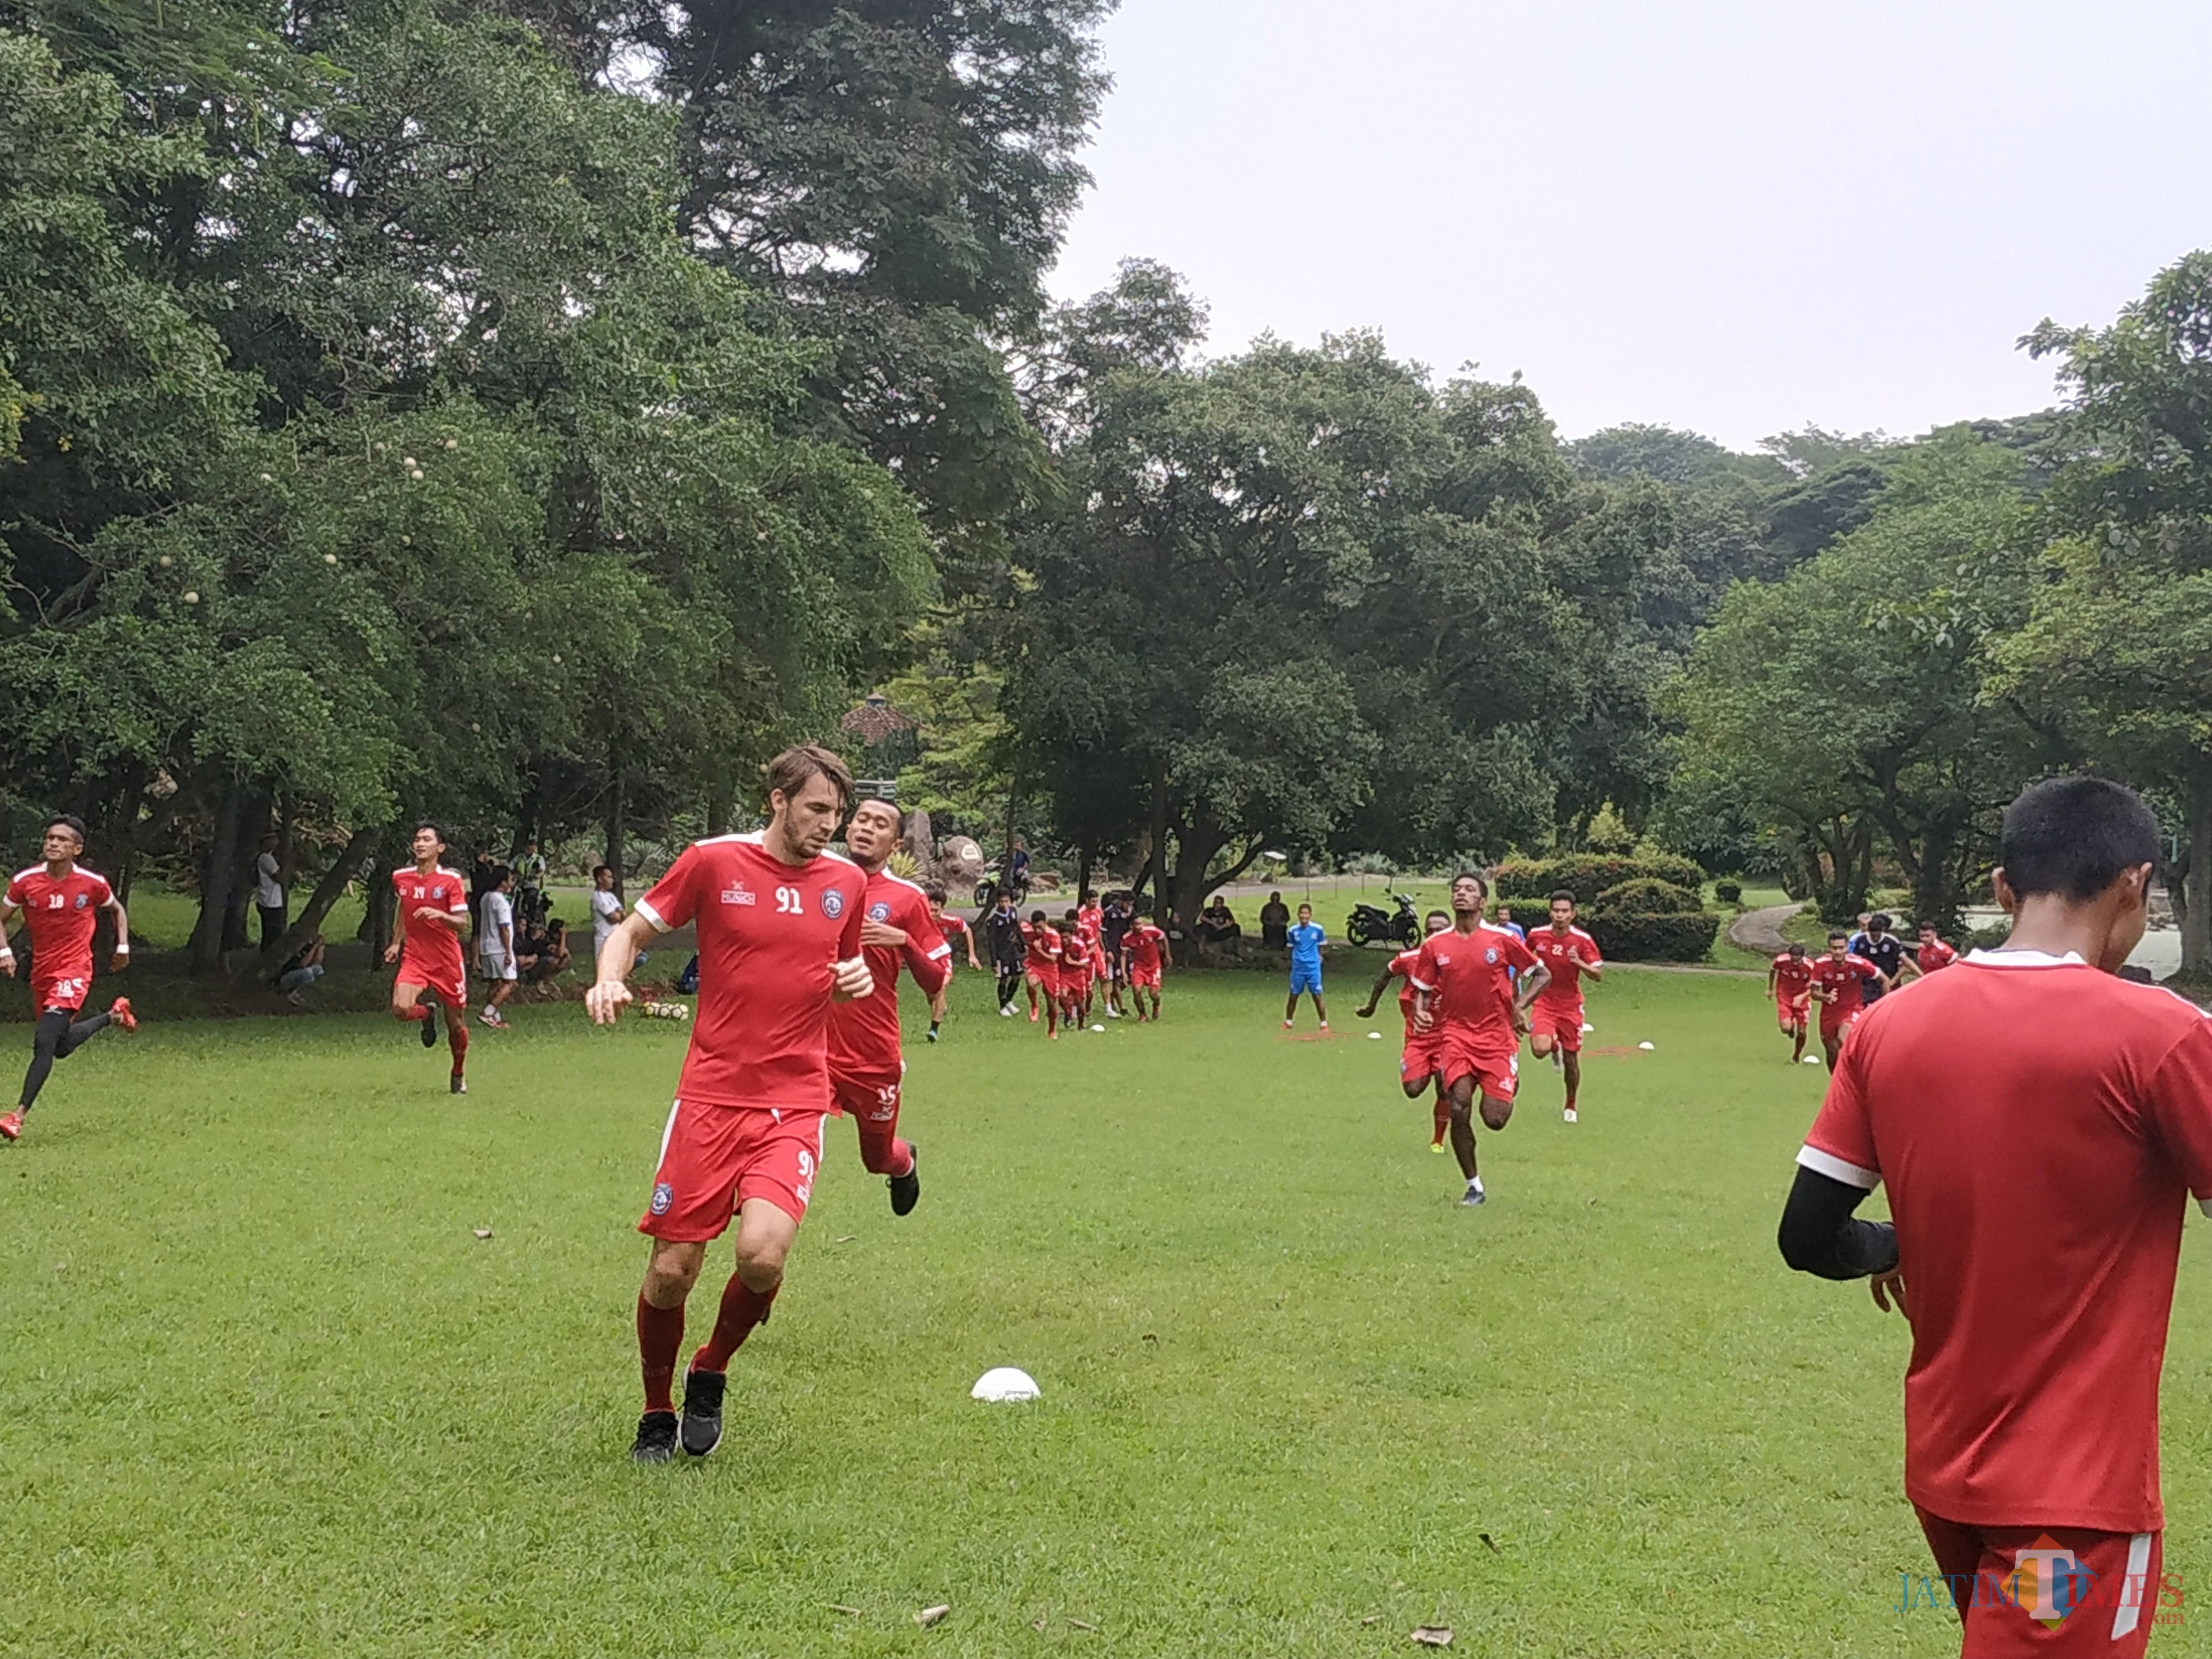 Suasana latihan Arema FC di Kebun Raya Purwodadi, Kabupaten Pasuruan, Selasa (19/3/2019) (Hendra Saputra)